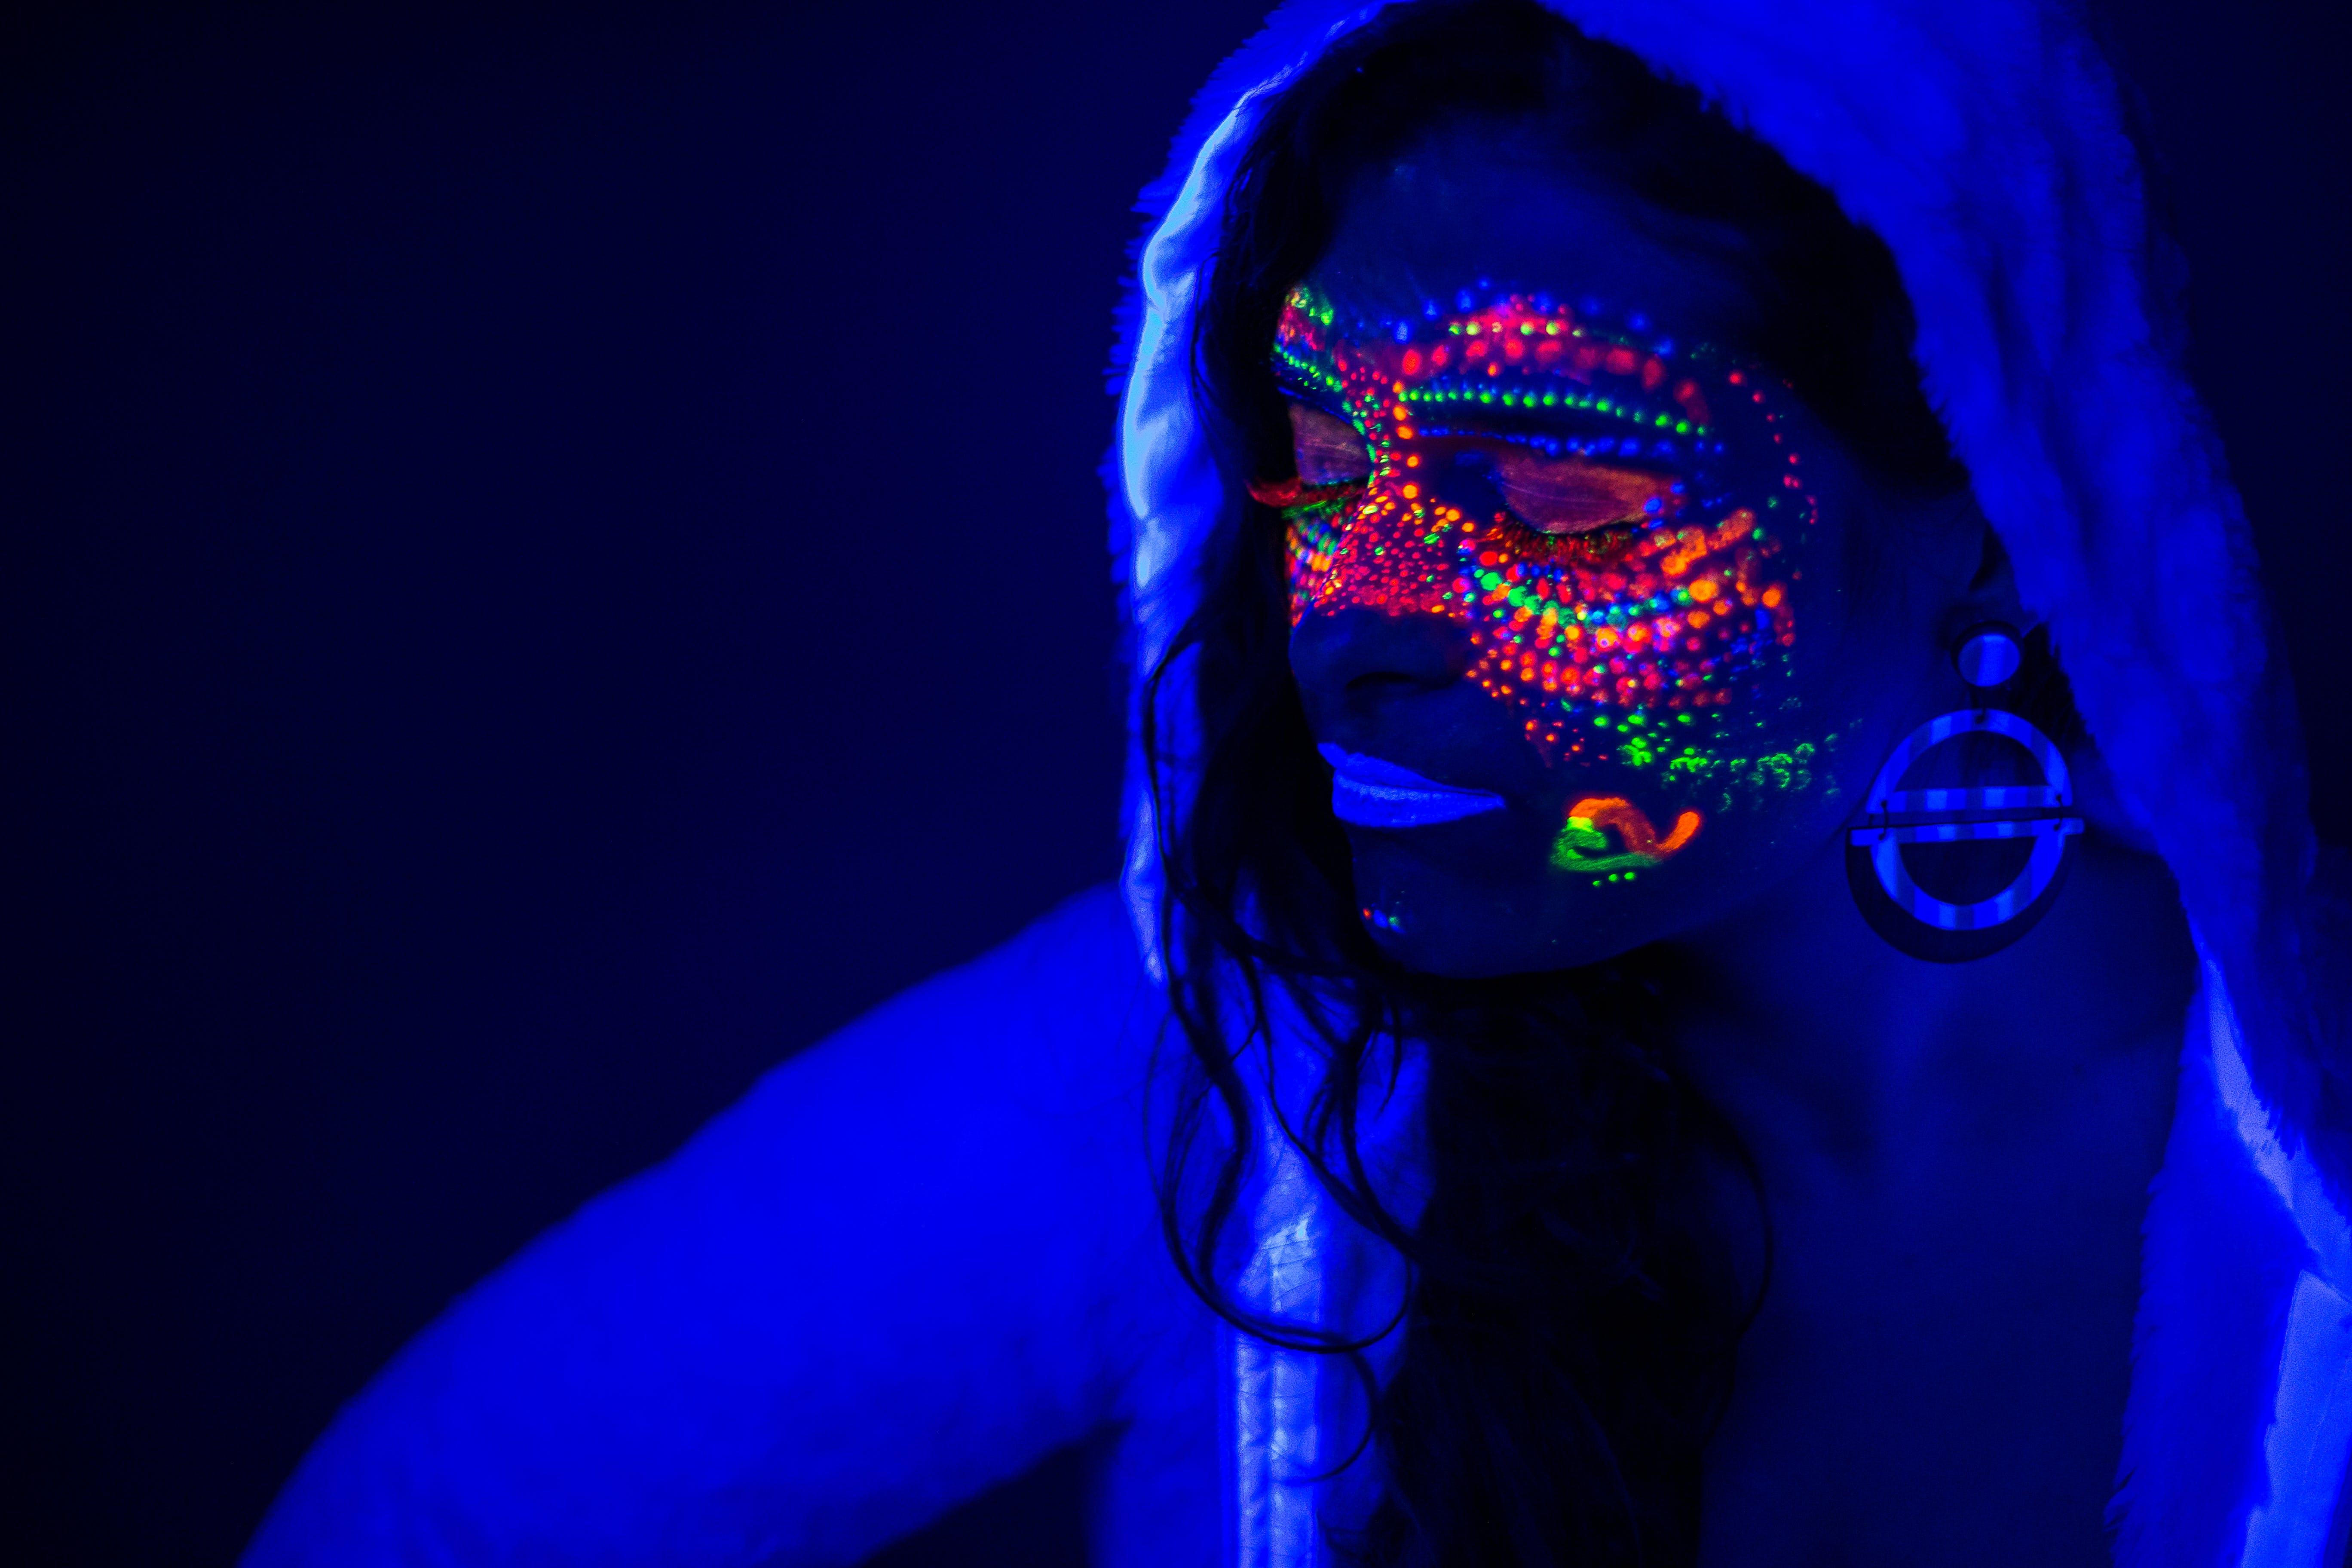 Kostenloses Stock Foto zu beleuchtet, beleuchtung, bunt, design